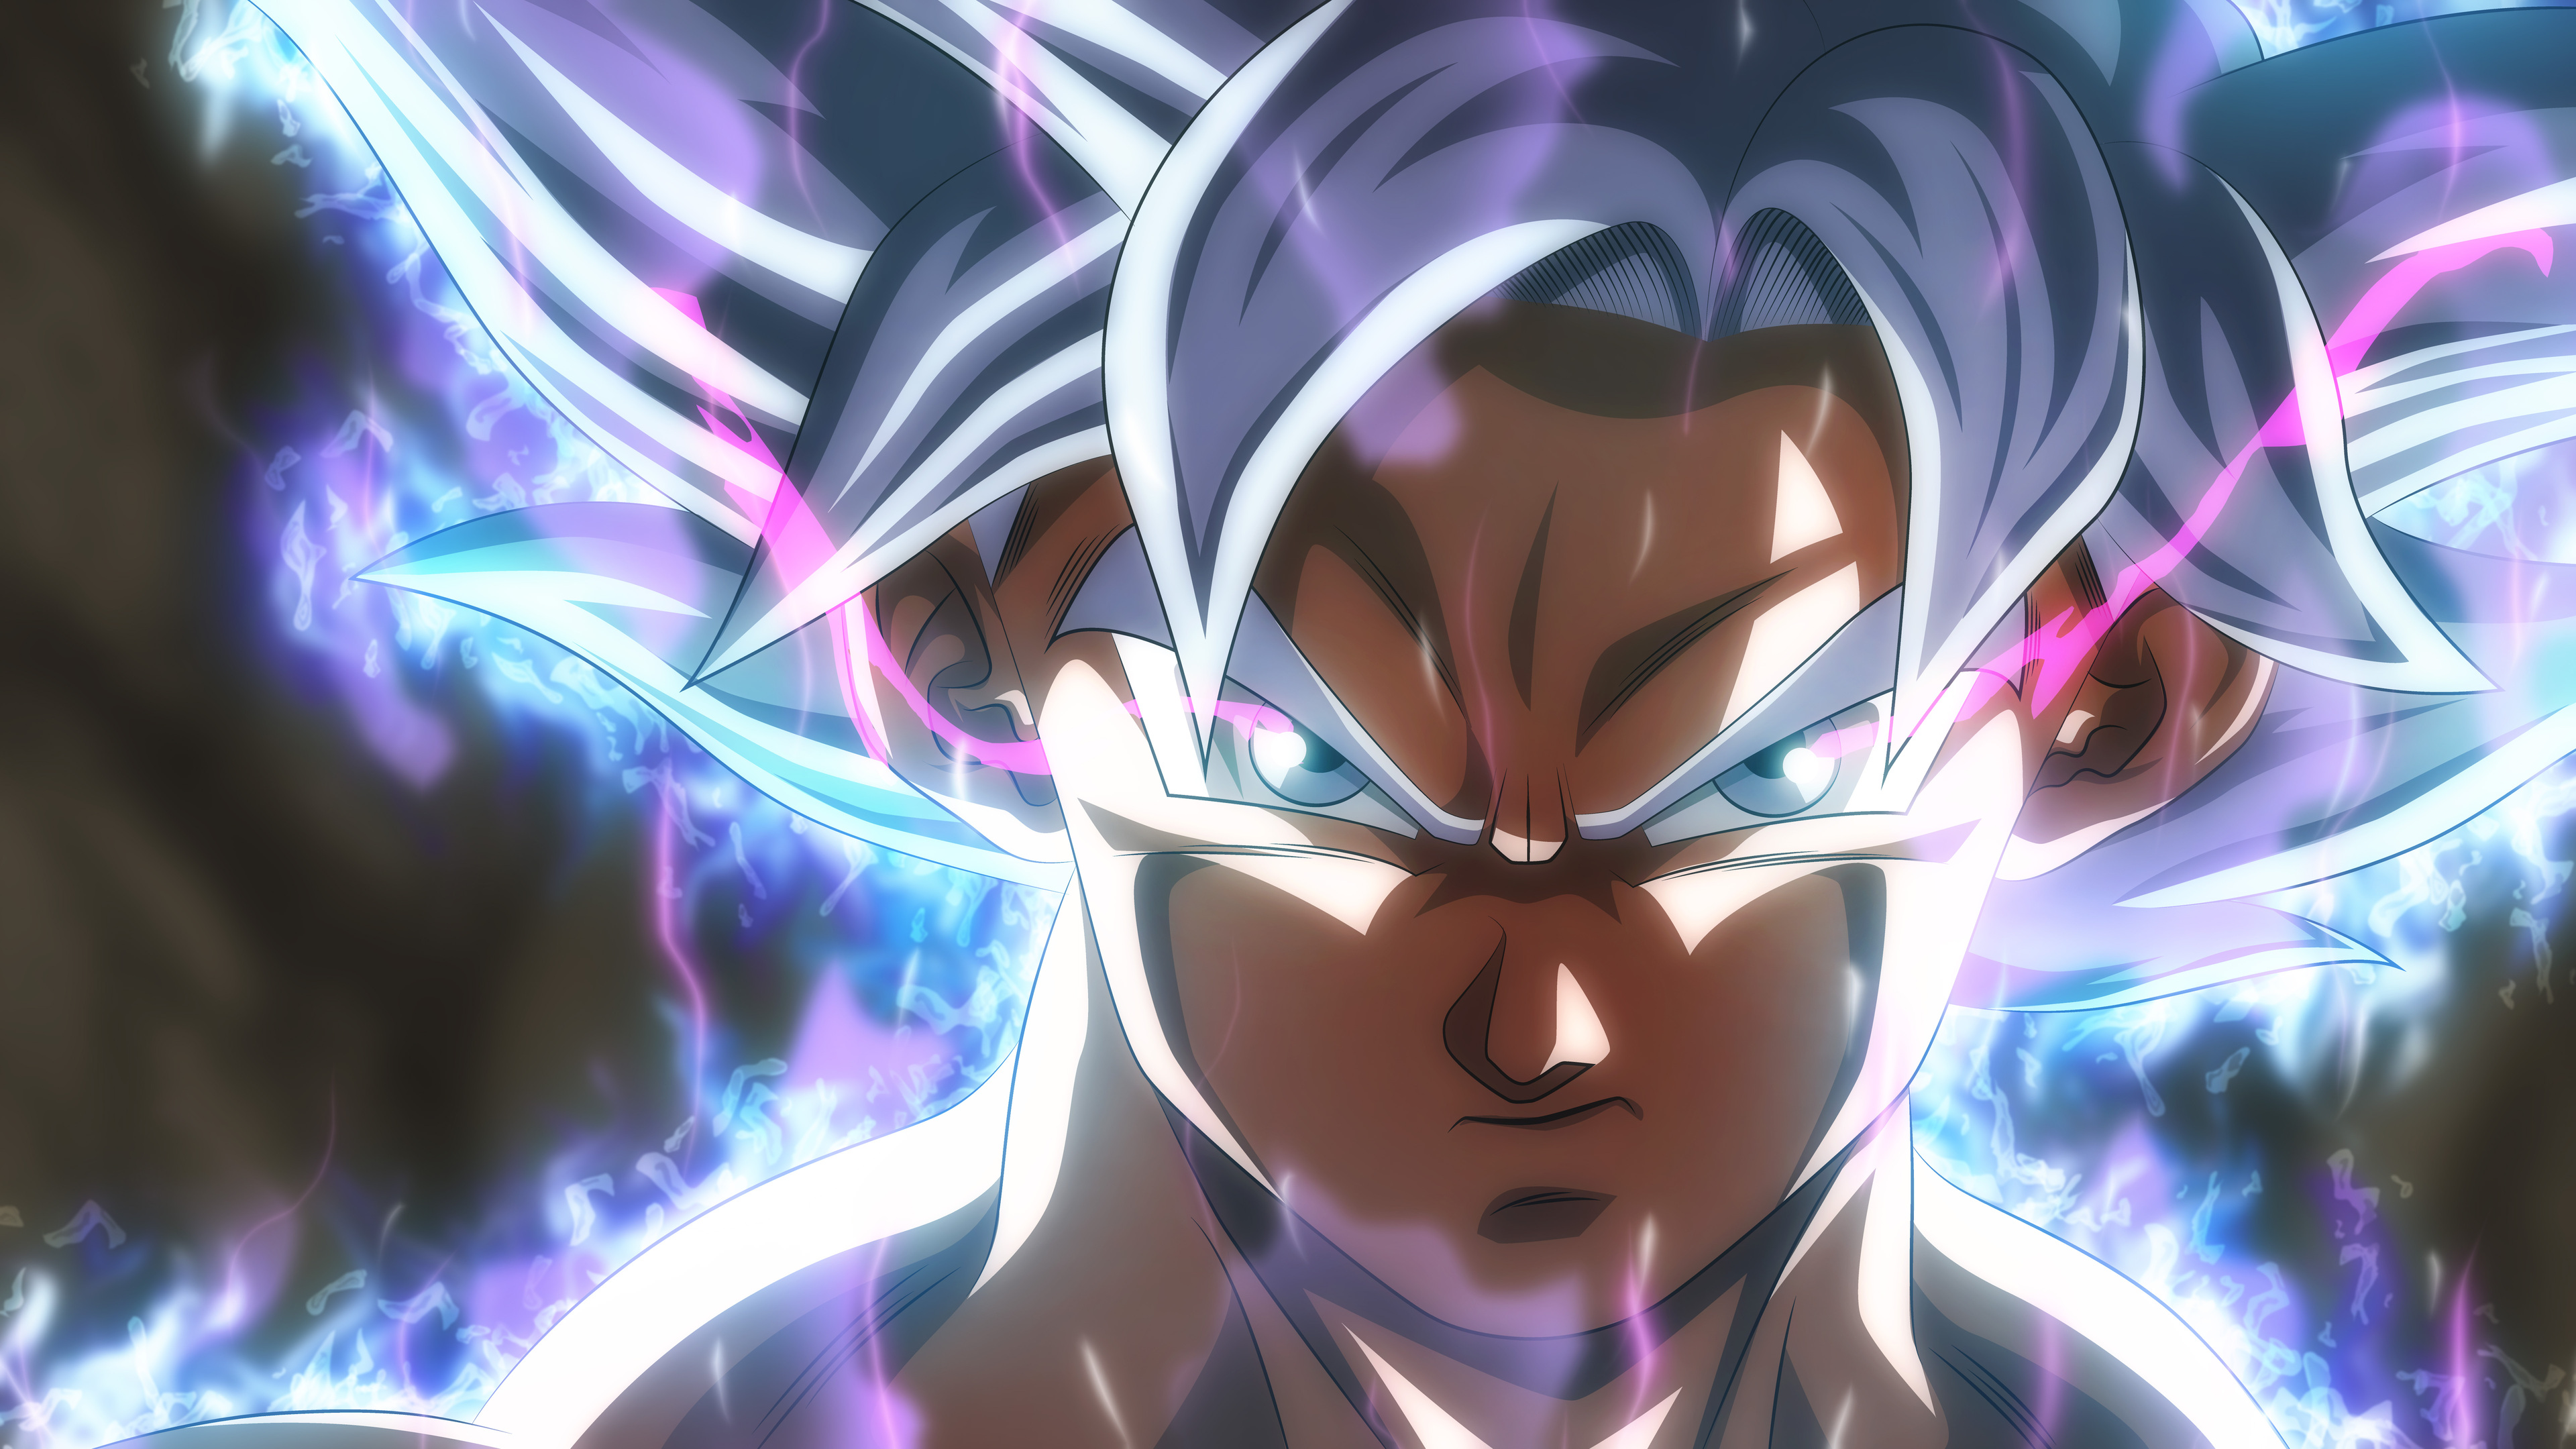 3840x2160 Son Goku Dragon Ball Super 8k Anime 4k Hd 4k Wallpapers